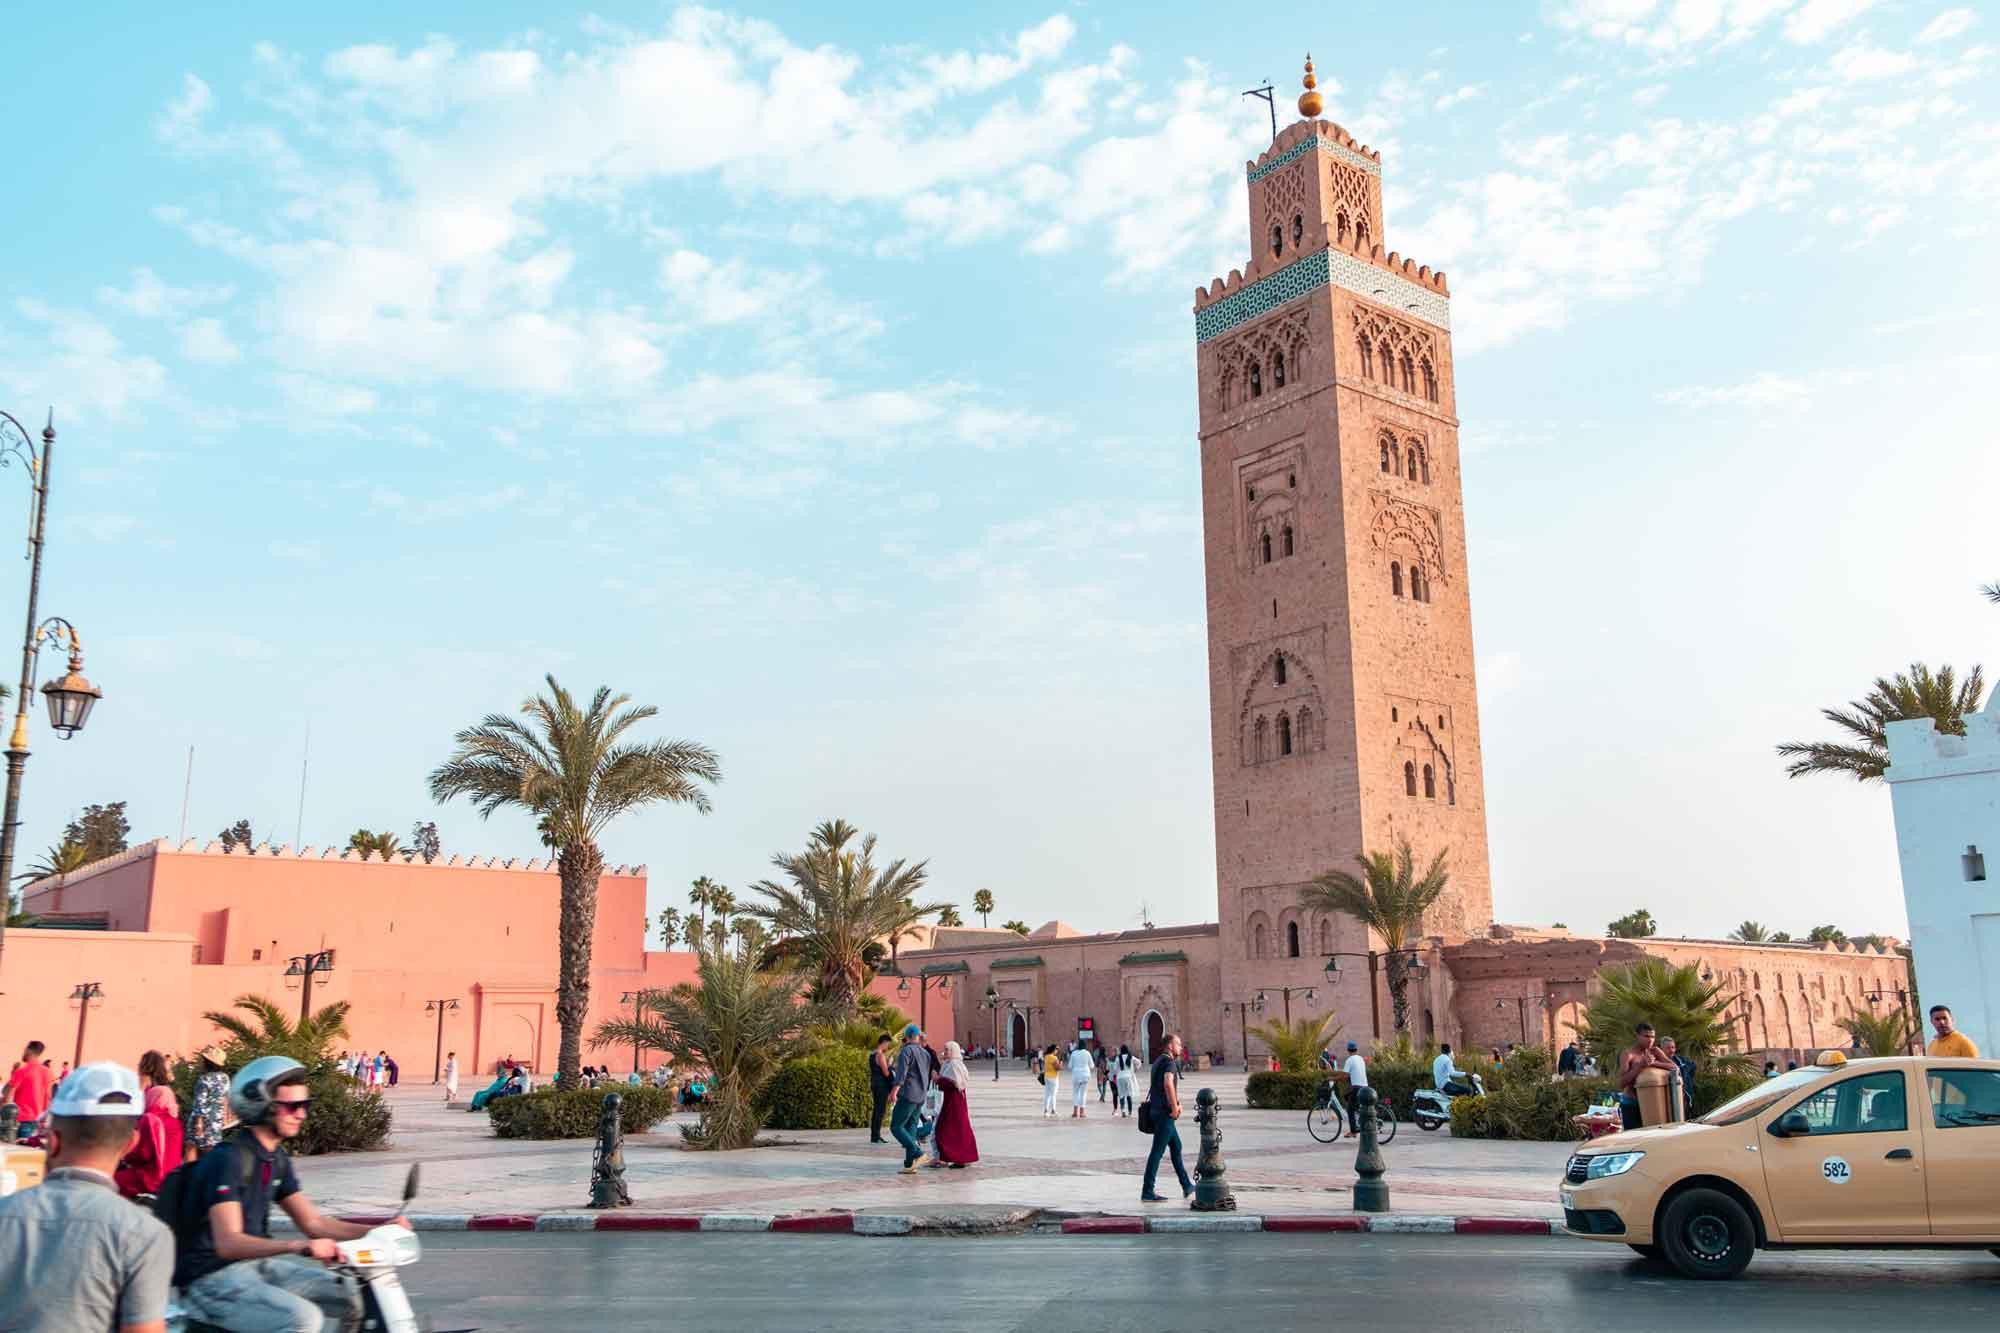 Pensieri-a-caldo-post-Marocco-Moschea-della-Kutubiyya